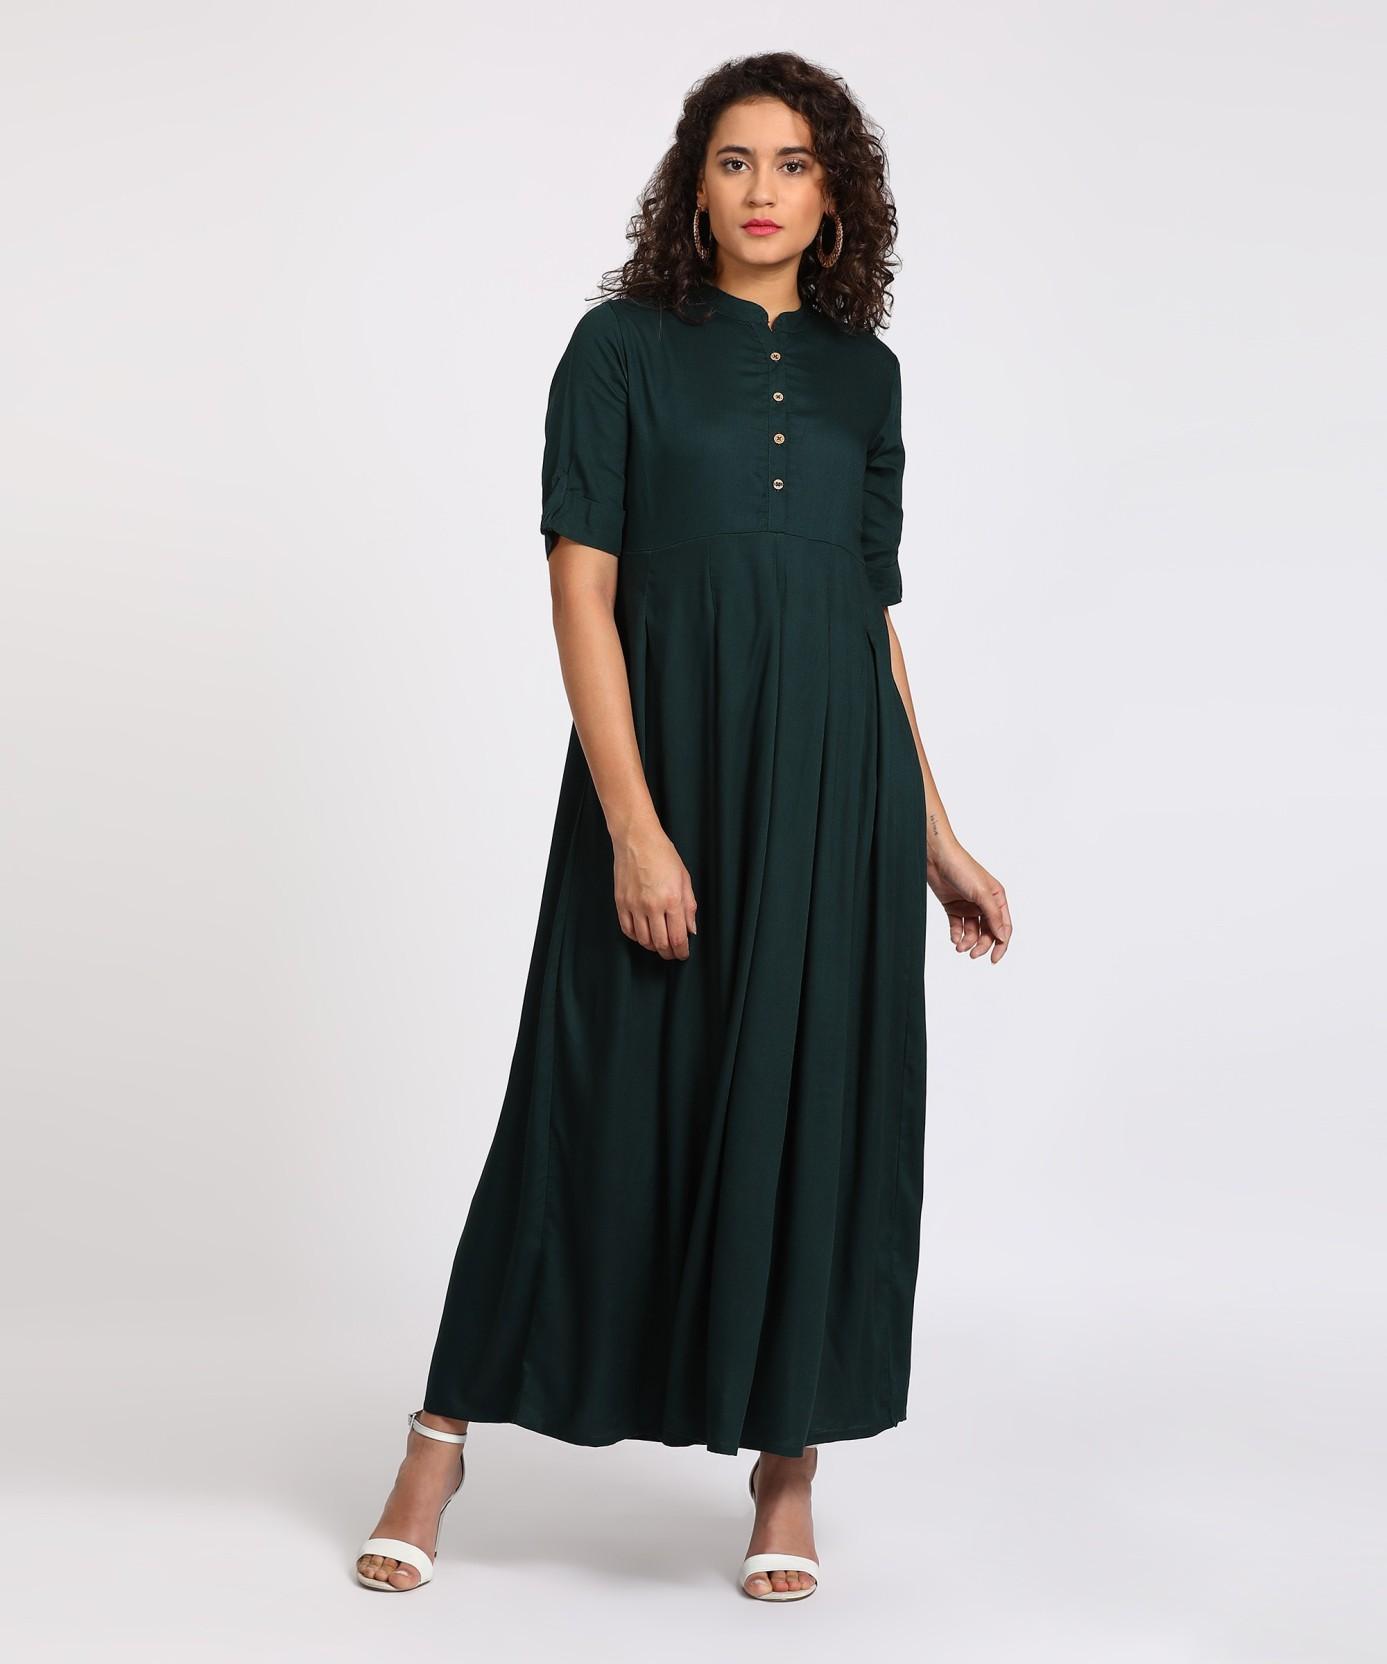 17f6b075aff Vishudh Women s Solid Gown Kurta - Buy TEAL. Vishudh Women s Solid ...